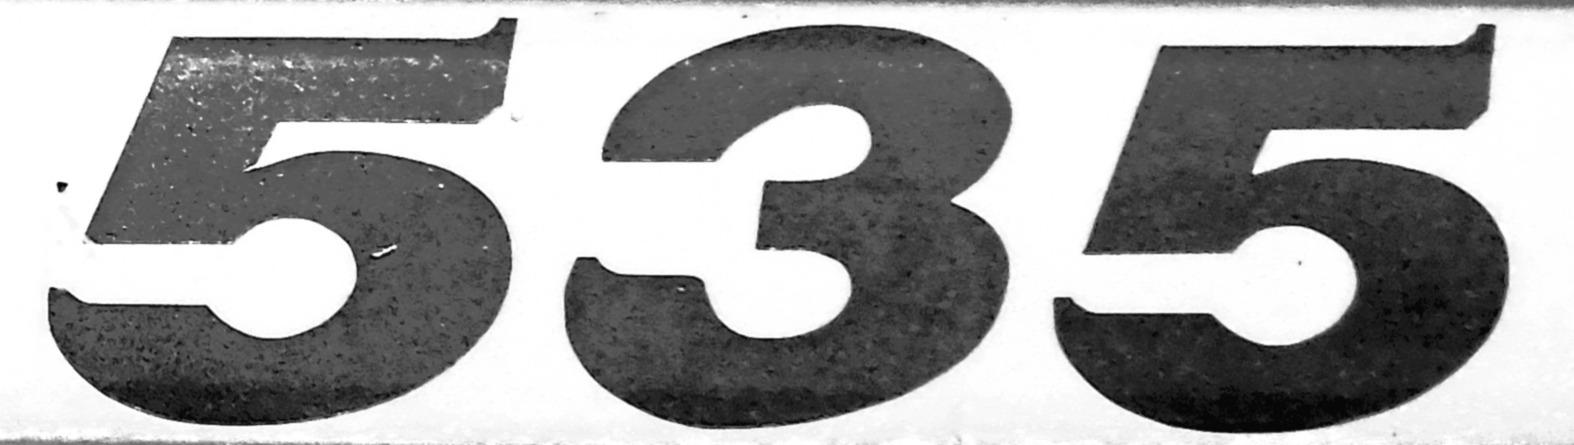 Number 535